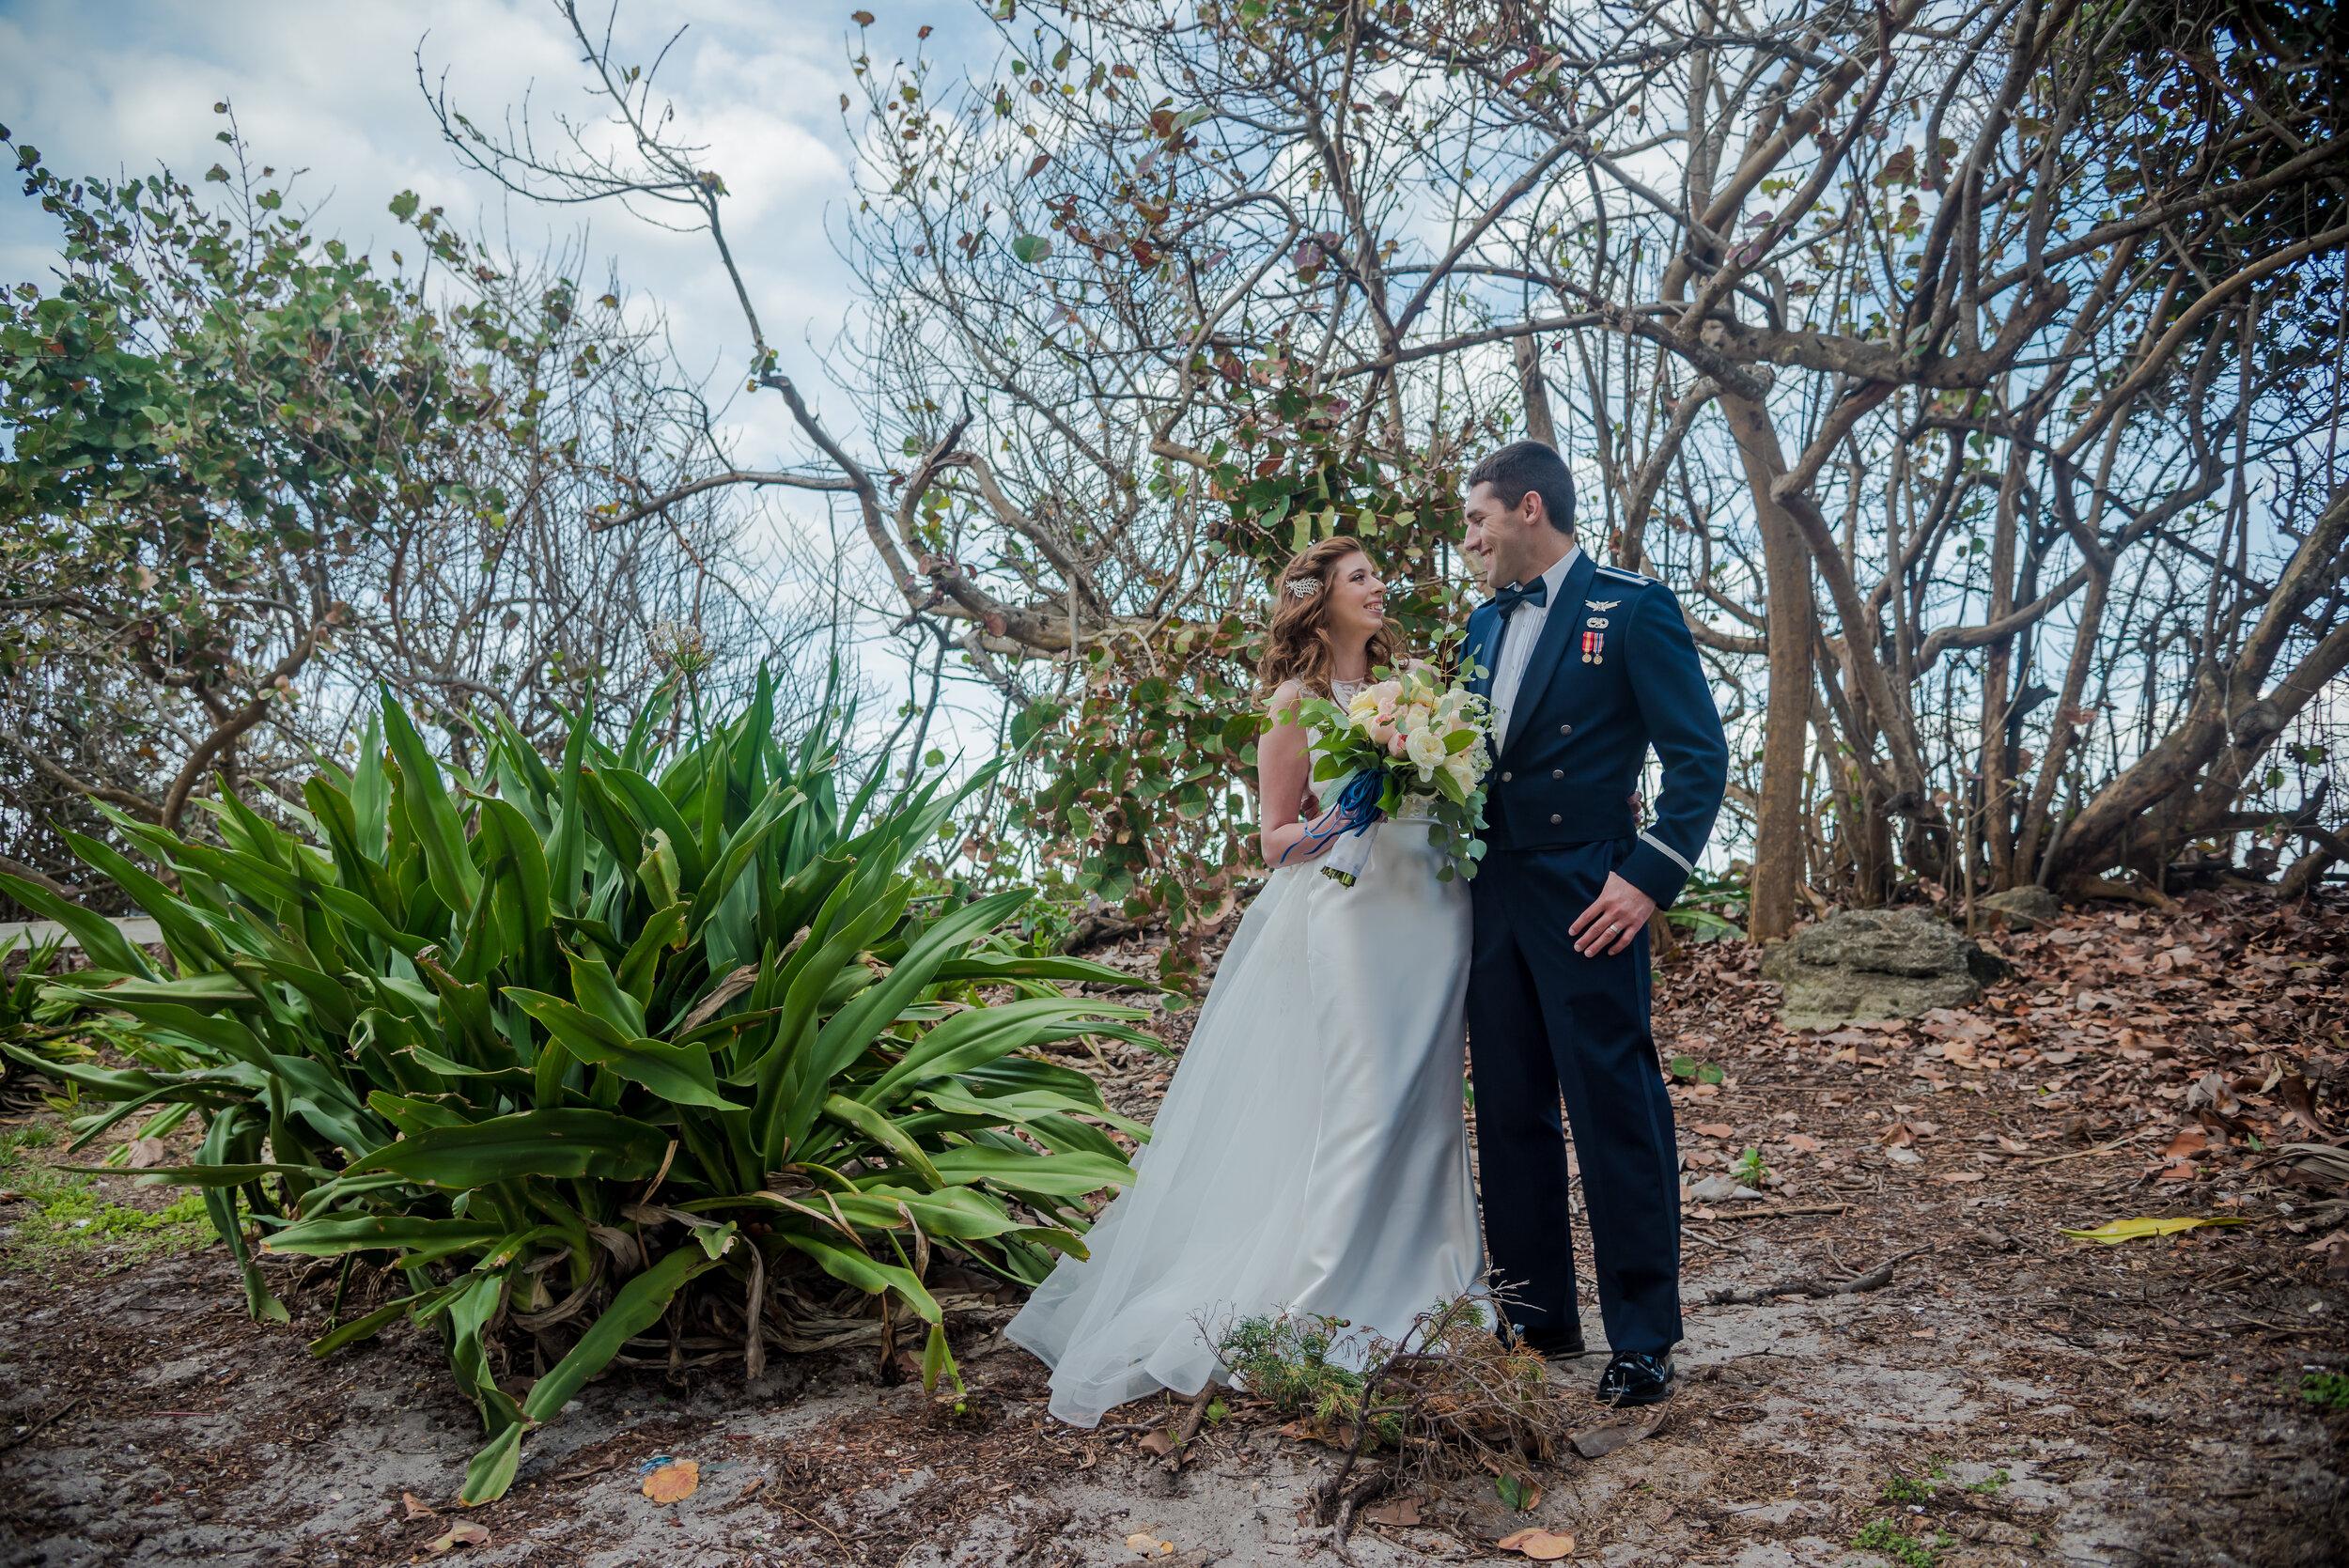 andru-the-tide-club-air-force-wedding-patrickafb-1-14.jpg